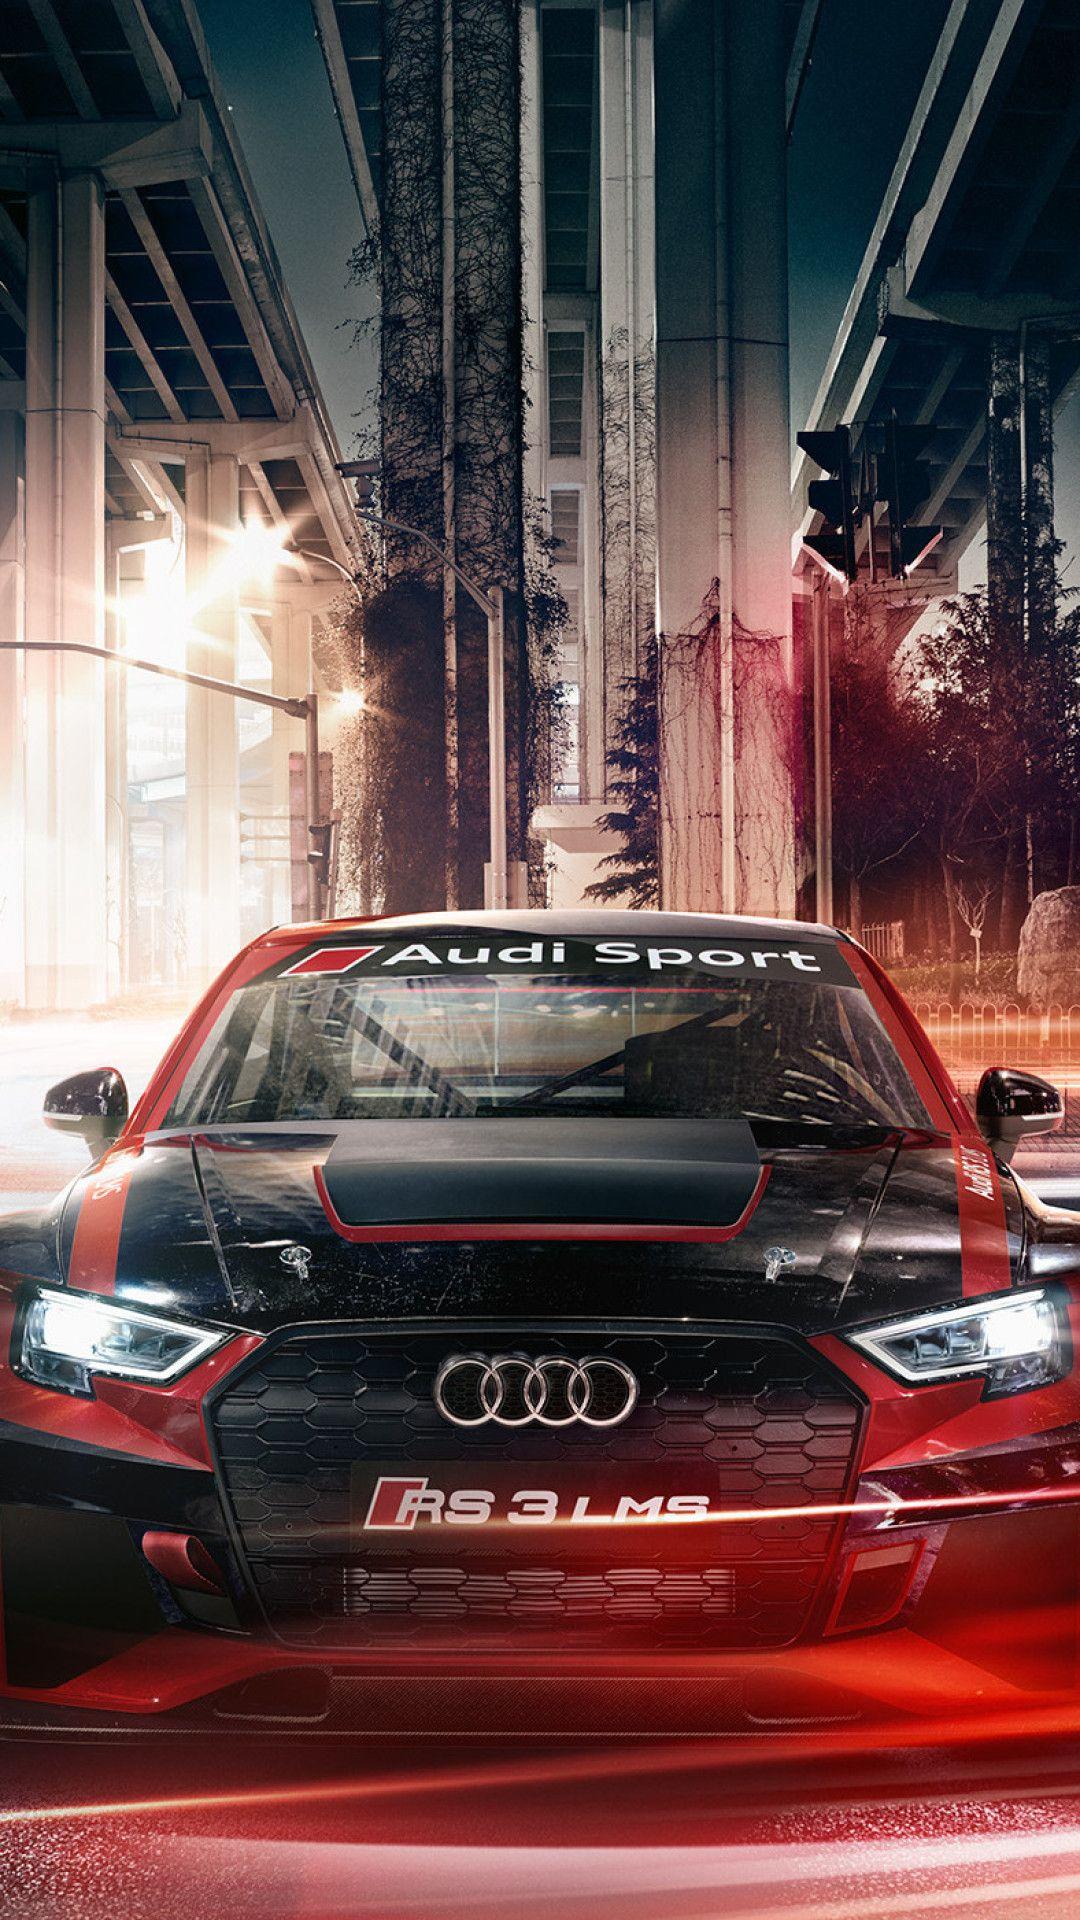 Audi Rs 3 Mobile Wallpaper Iphone Android Samsung Pixel Xiaomi Audi Rs Luxury Cars Audi Audi